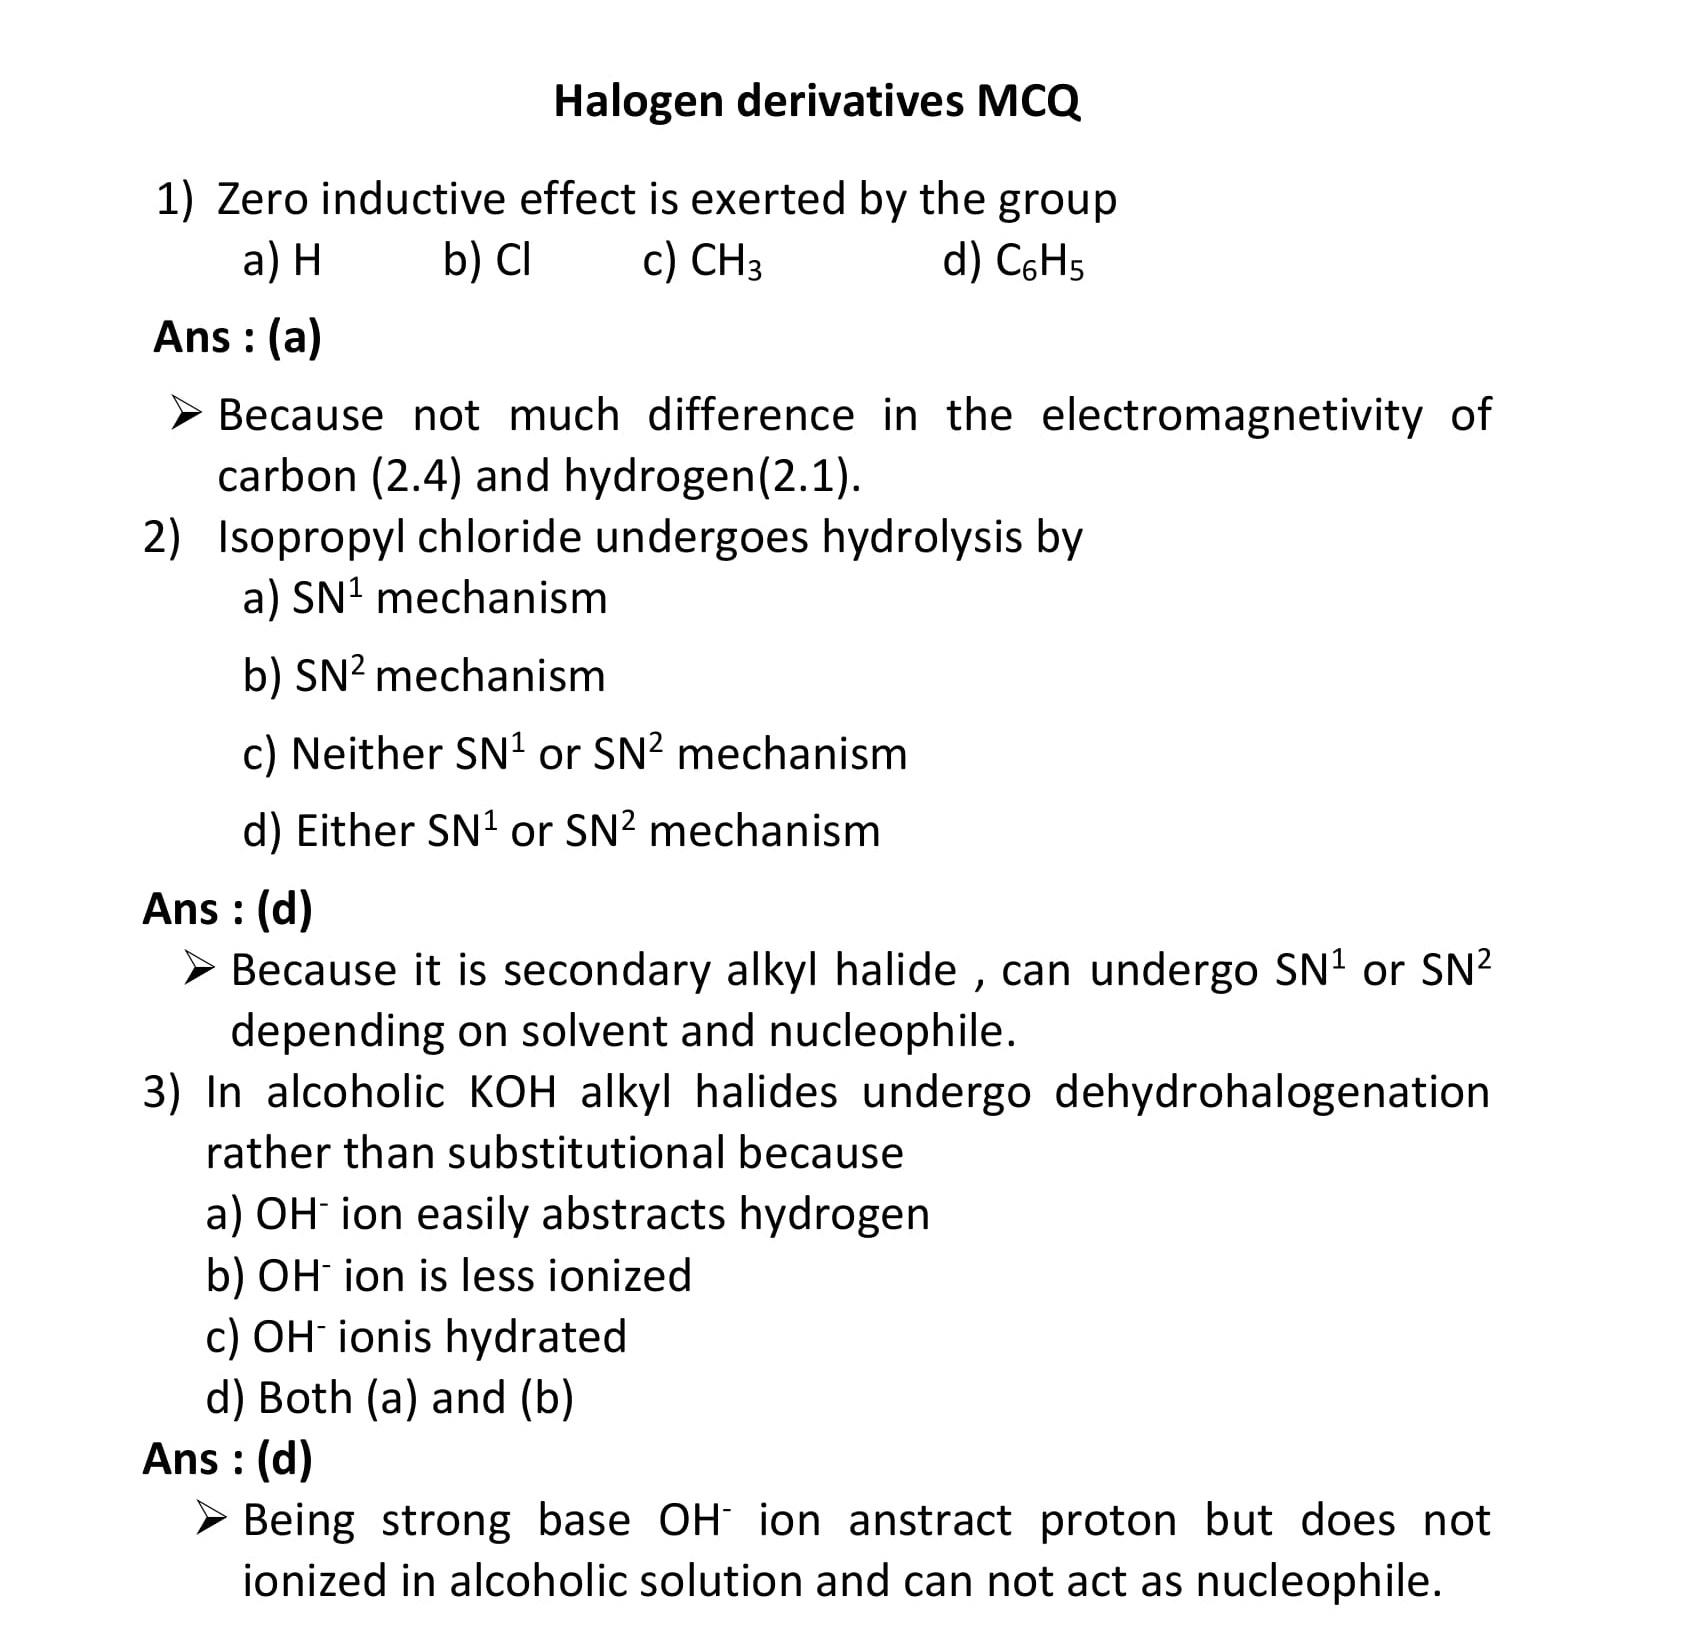 Halogen-derivatives-MCQ-1-1